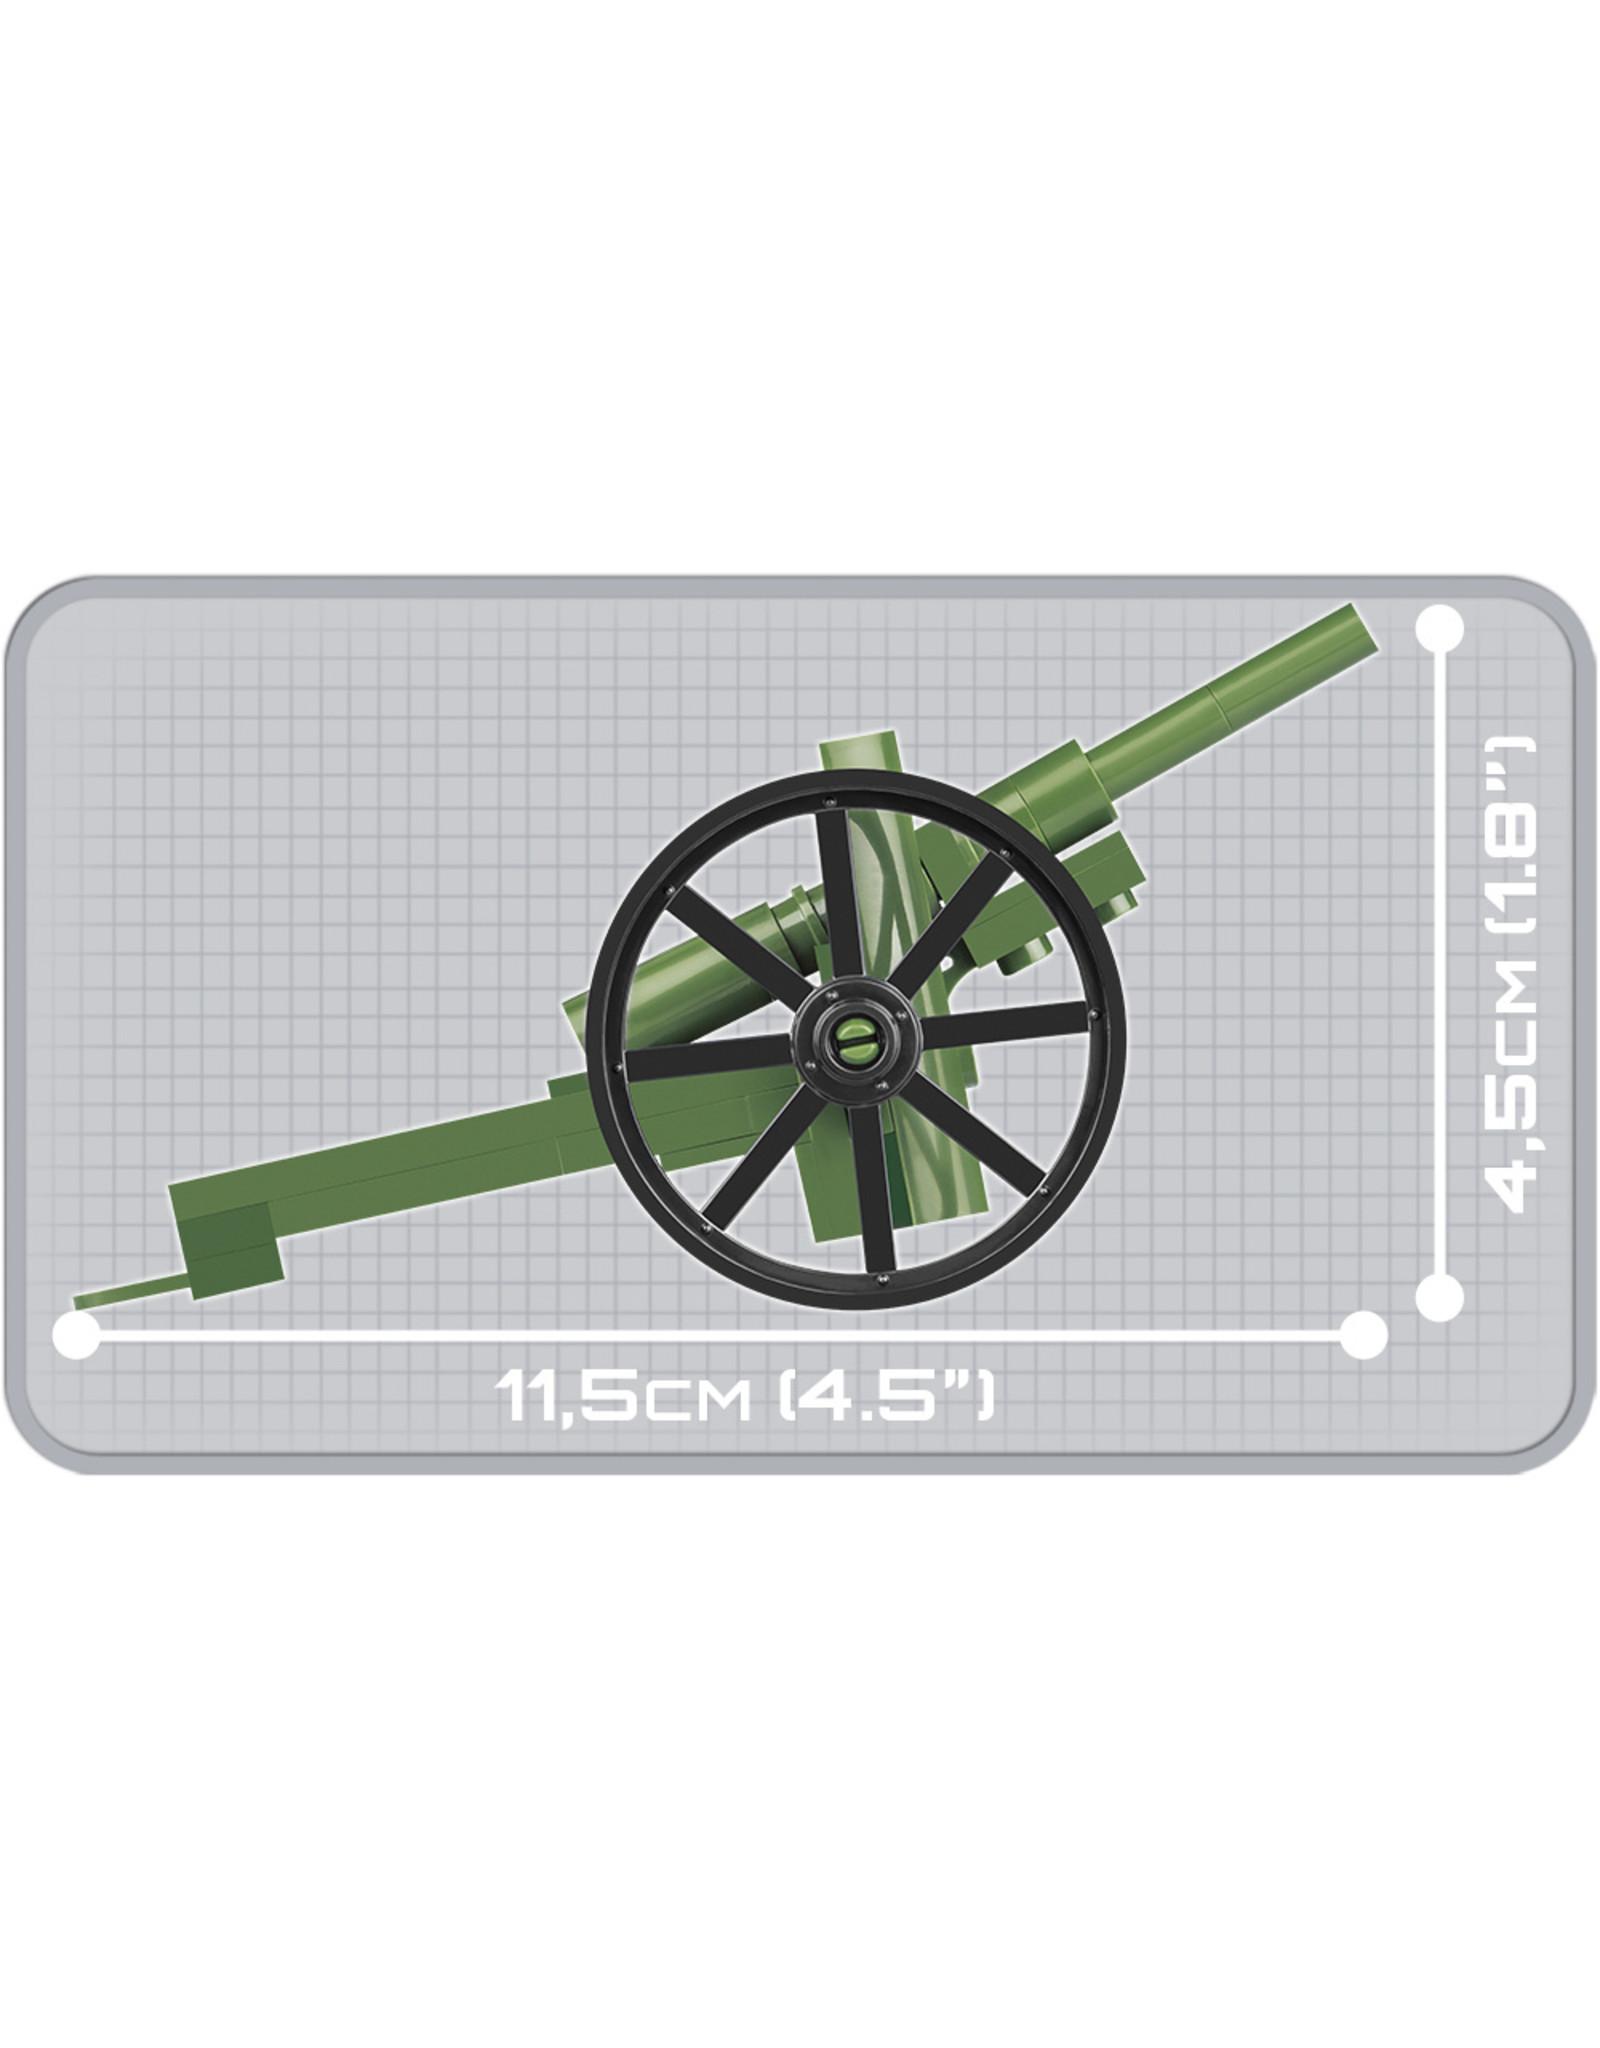 COBI COBI WW1 2979 - Schneider Gun 75mm